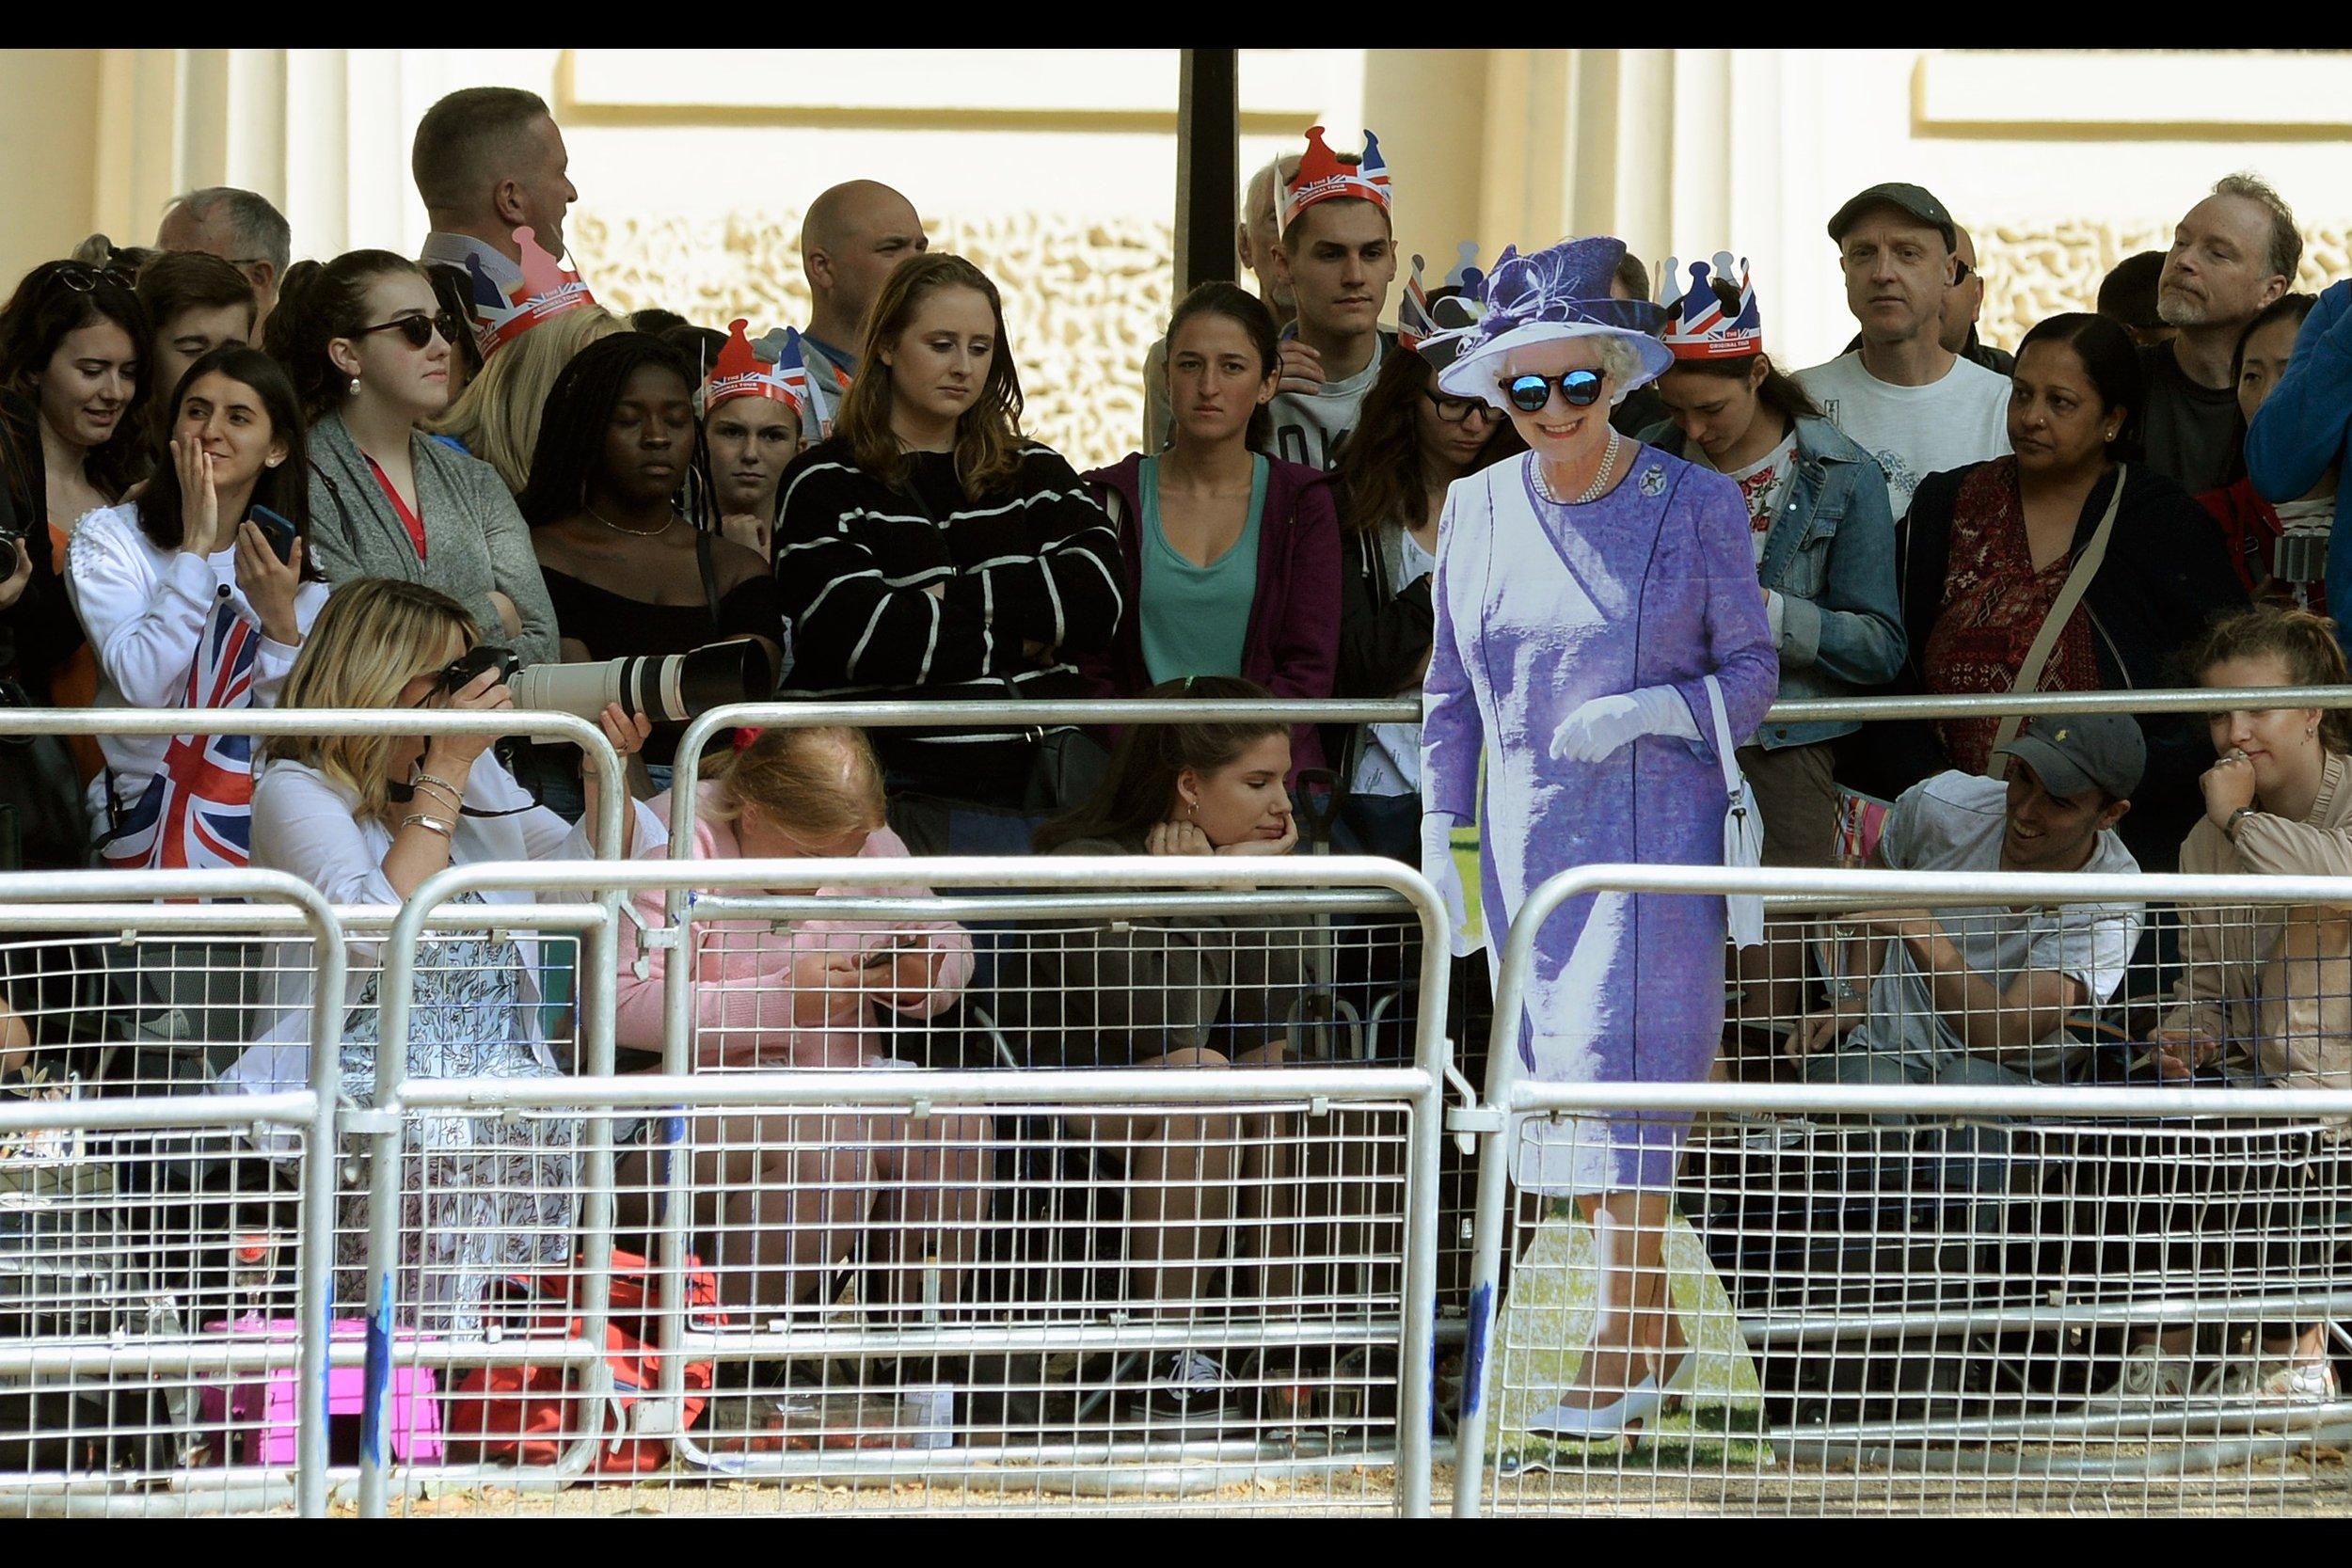 Looks like I can go home early - I've photographed Her Majesty already!